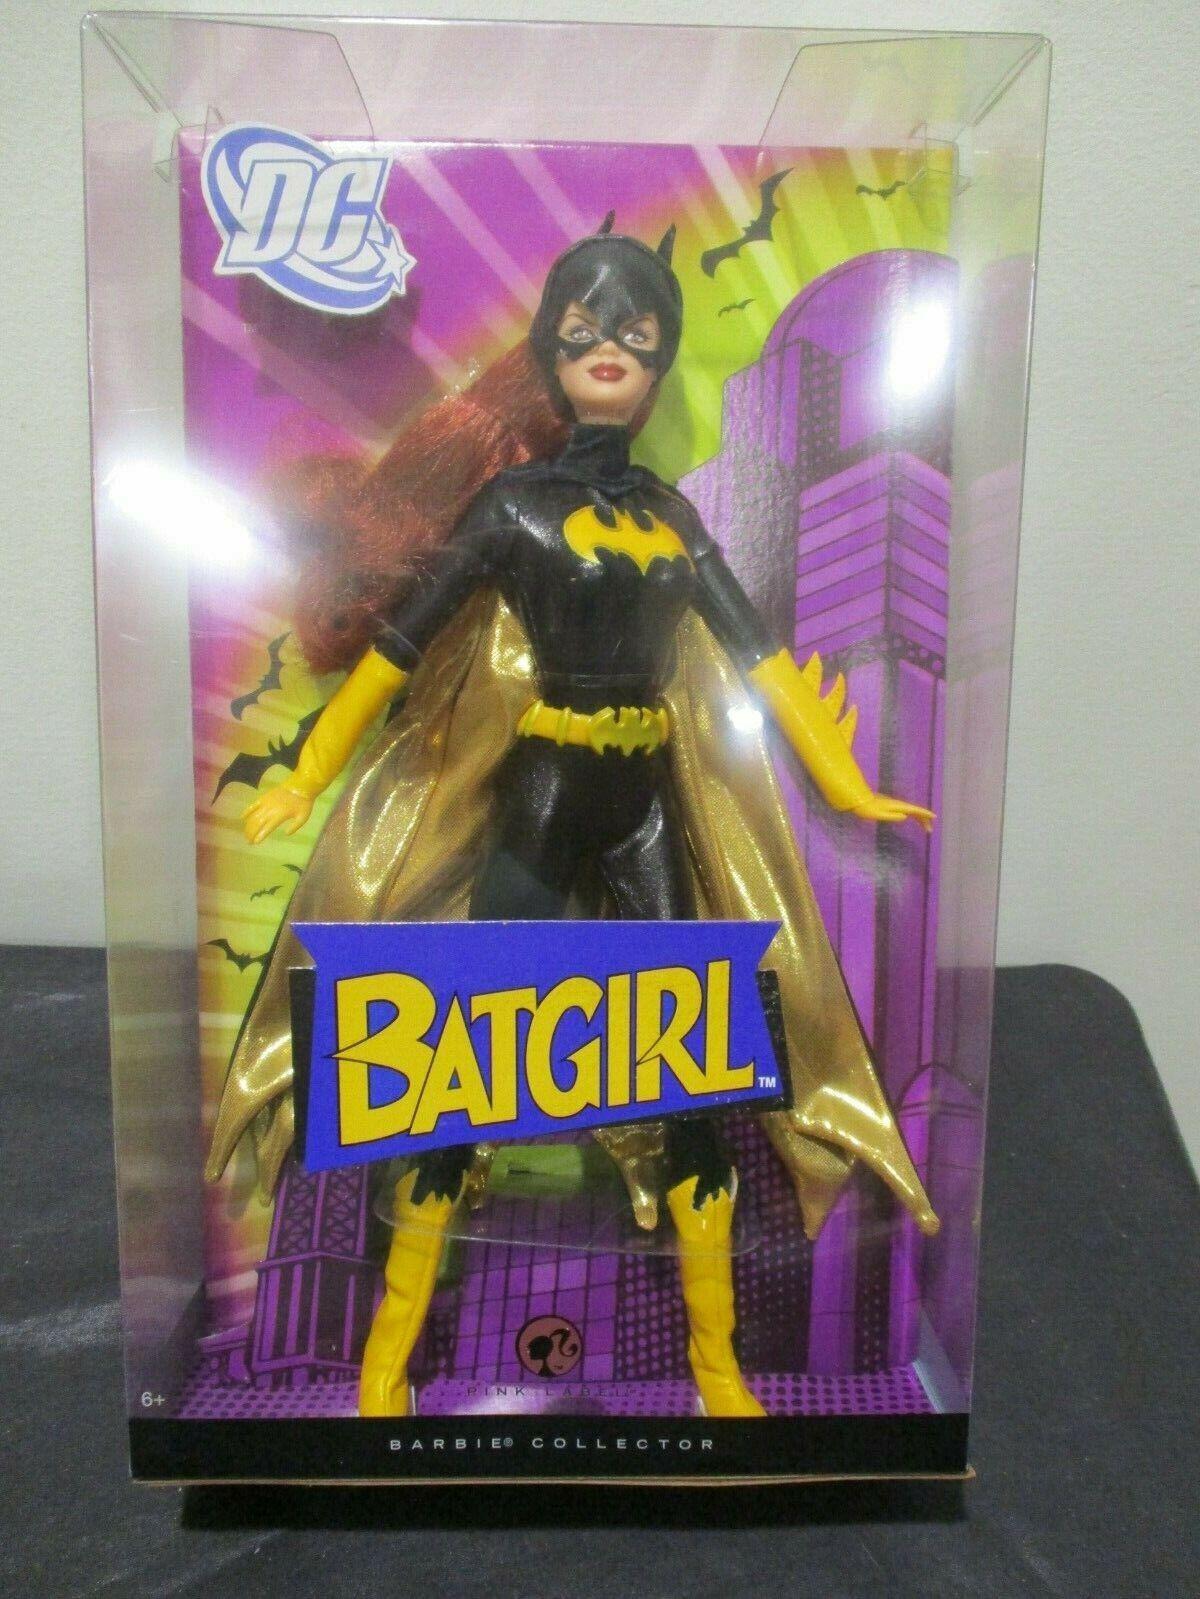 NEW  Batgirl  Barbie Doll DC Comics 2008 Silber Label Mattel NIB Collectible